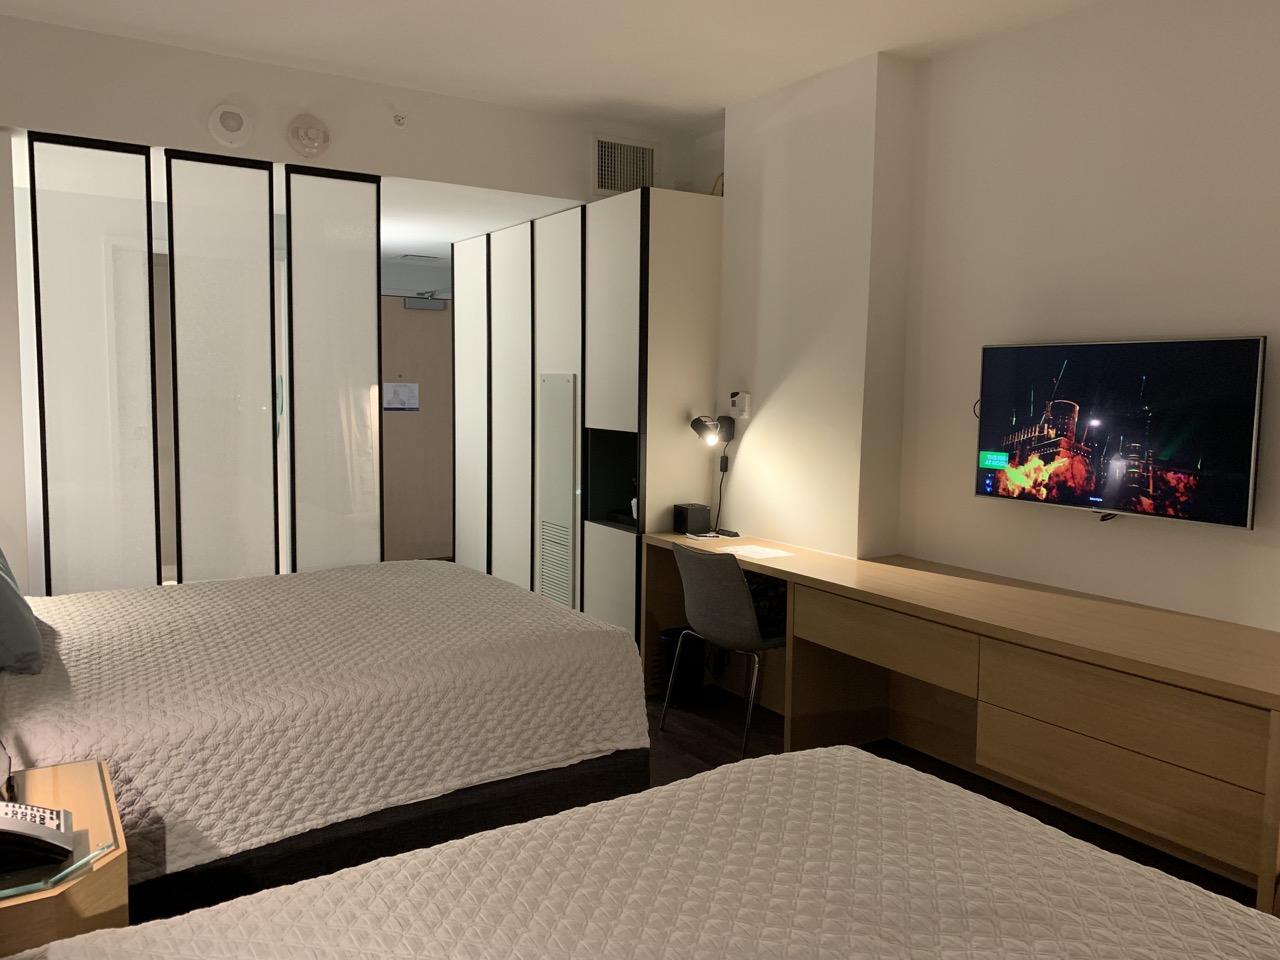 universal aventura hotel review room 7.jpeg